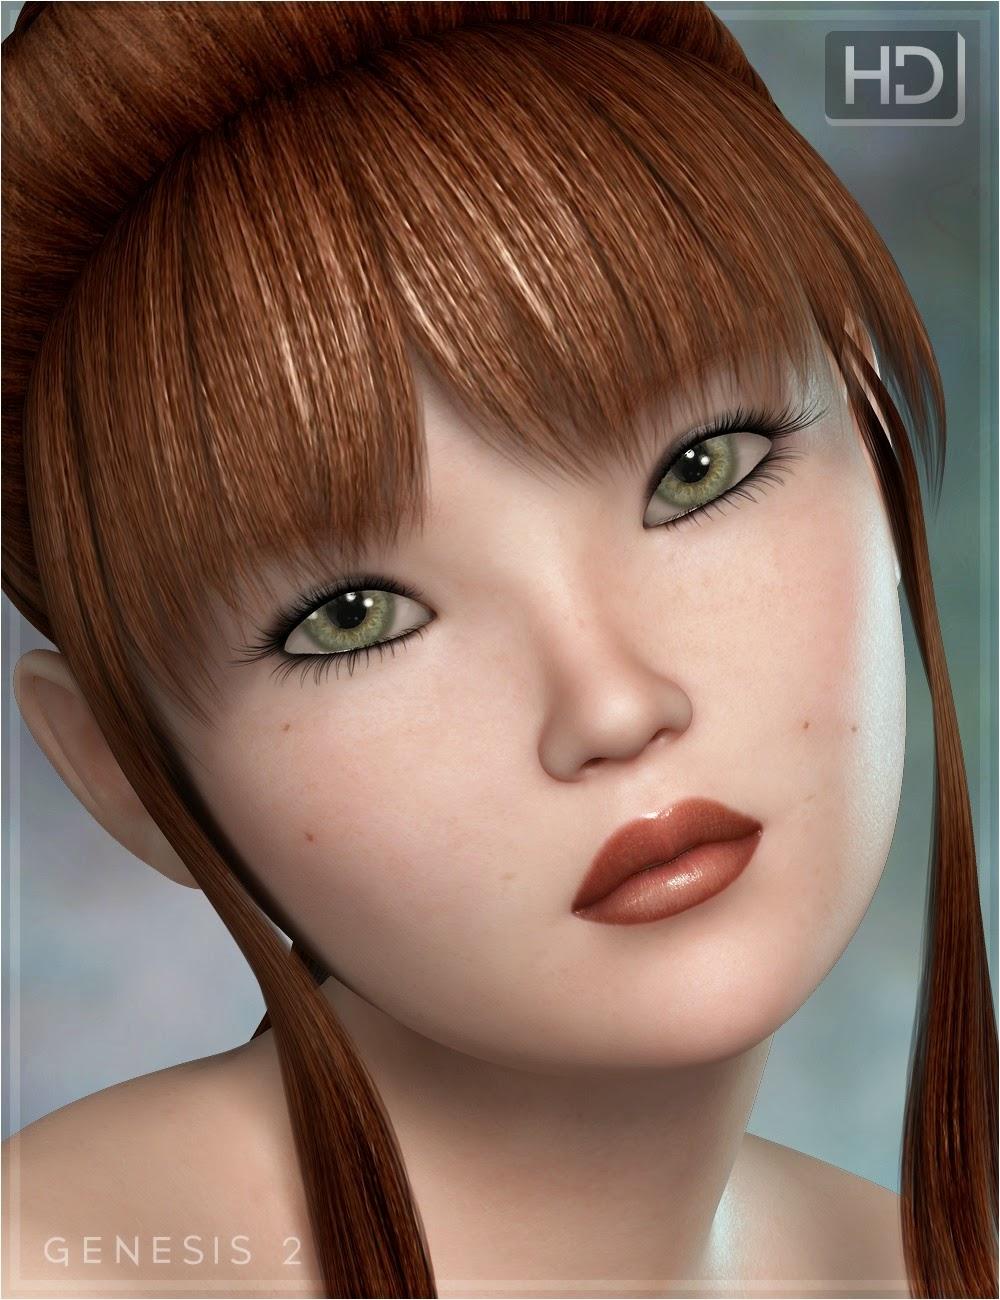 Amélie pour Keiko 6 HD